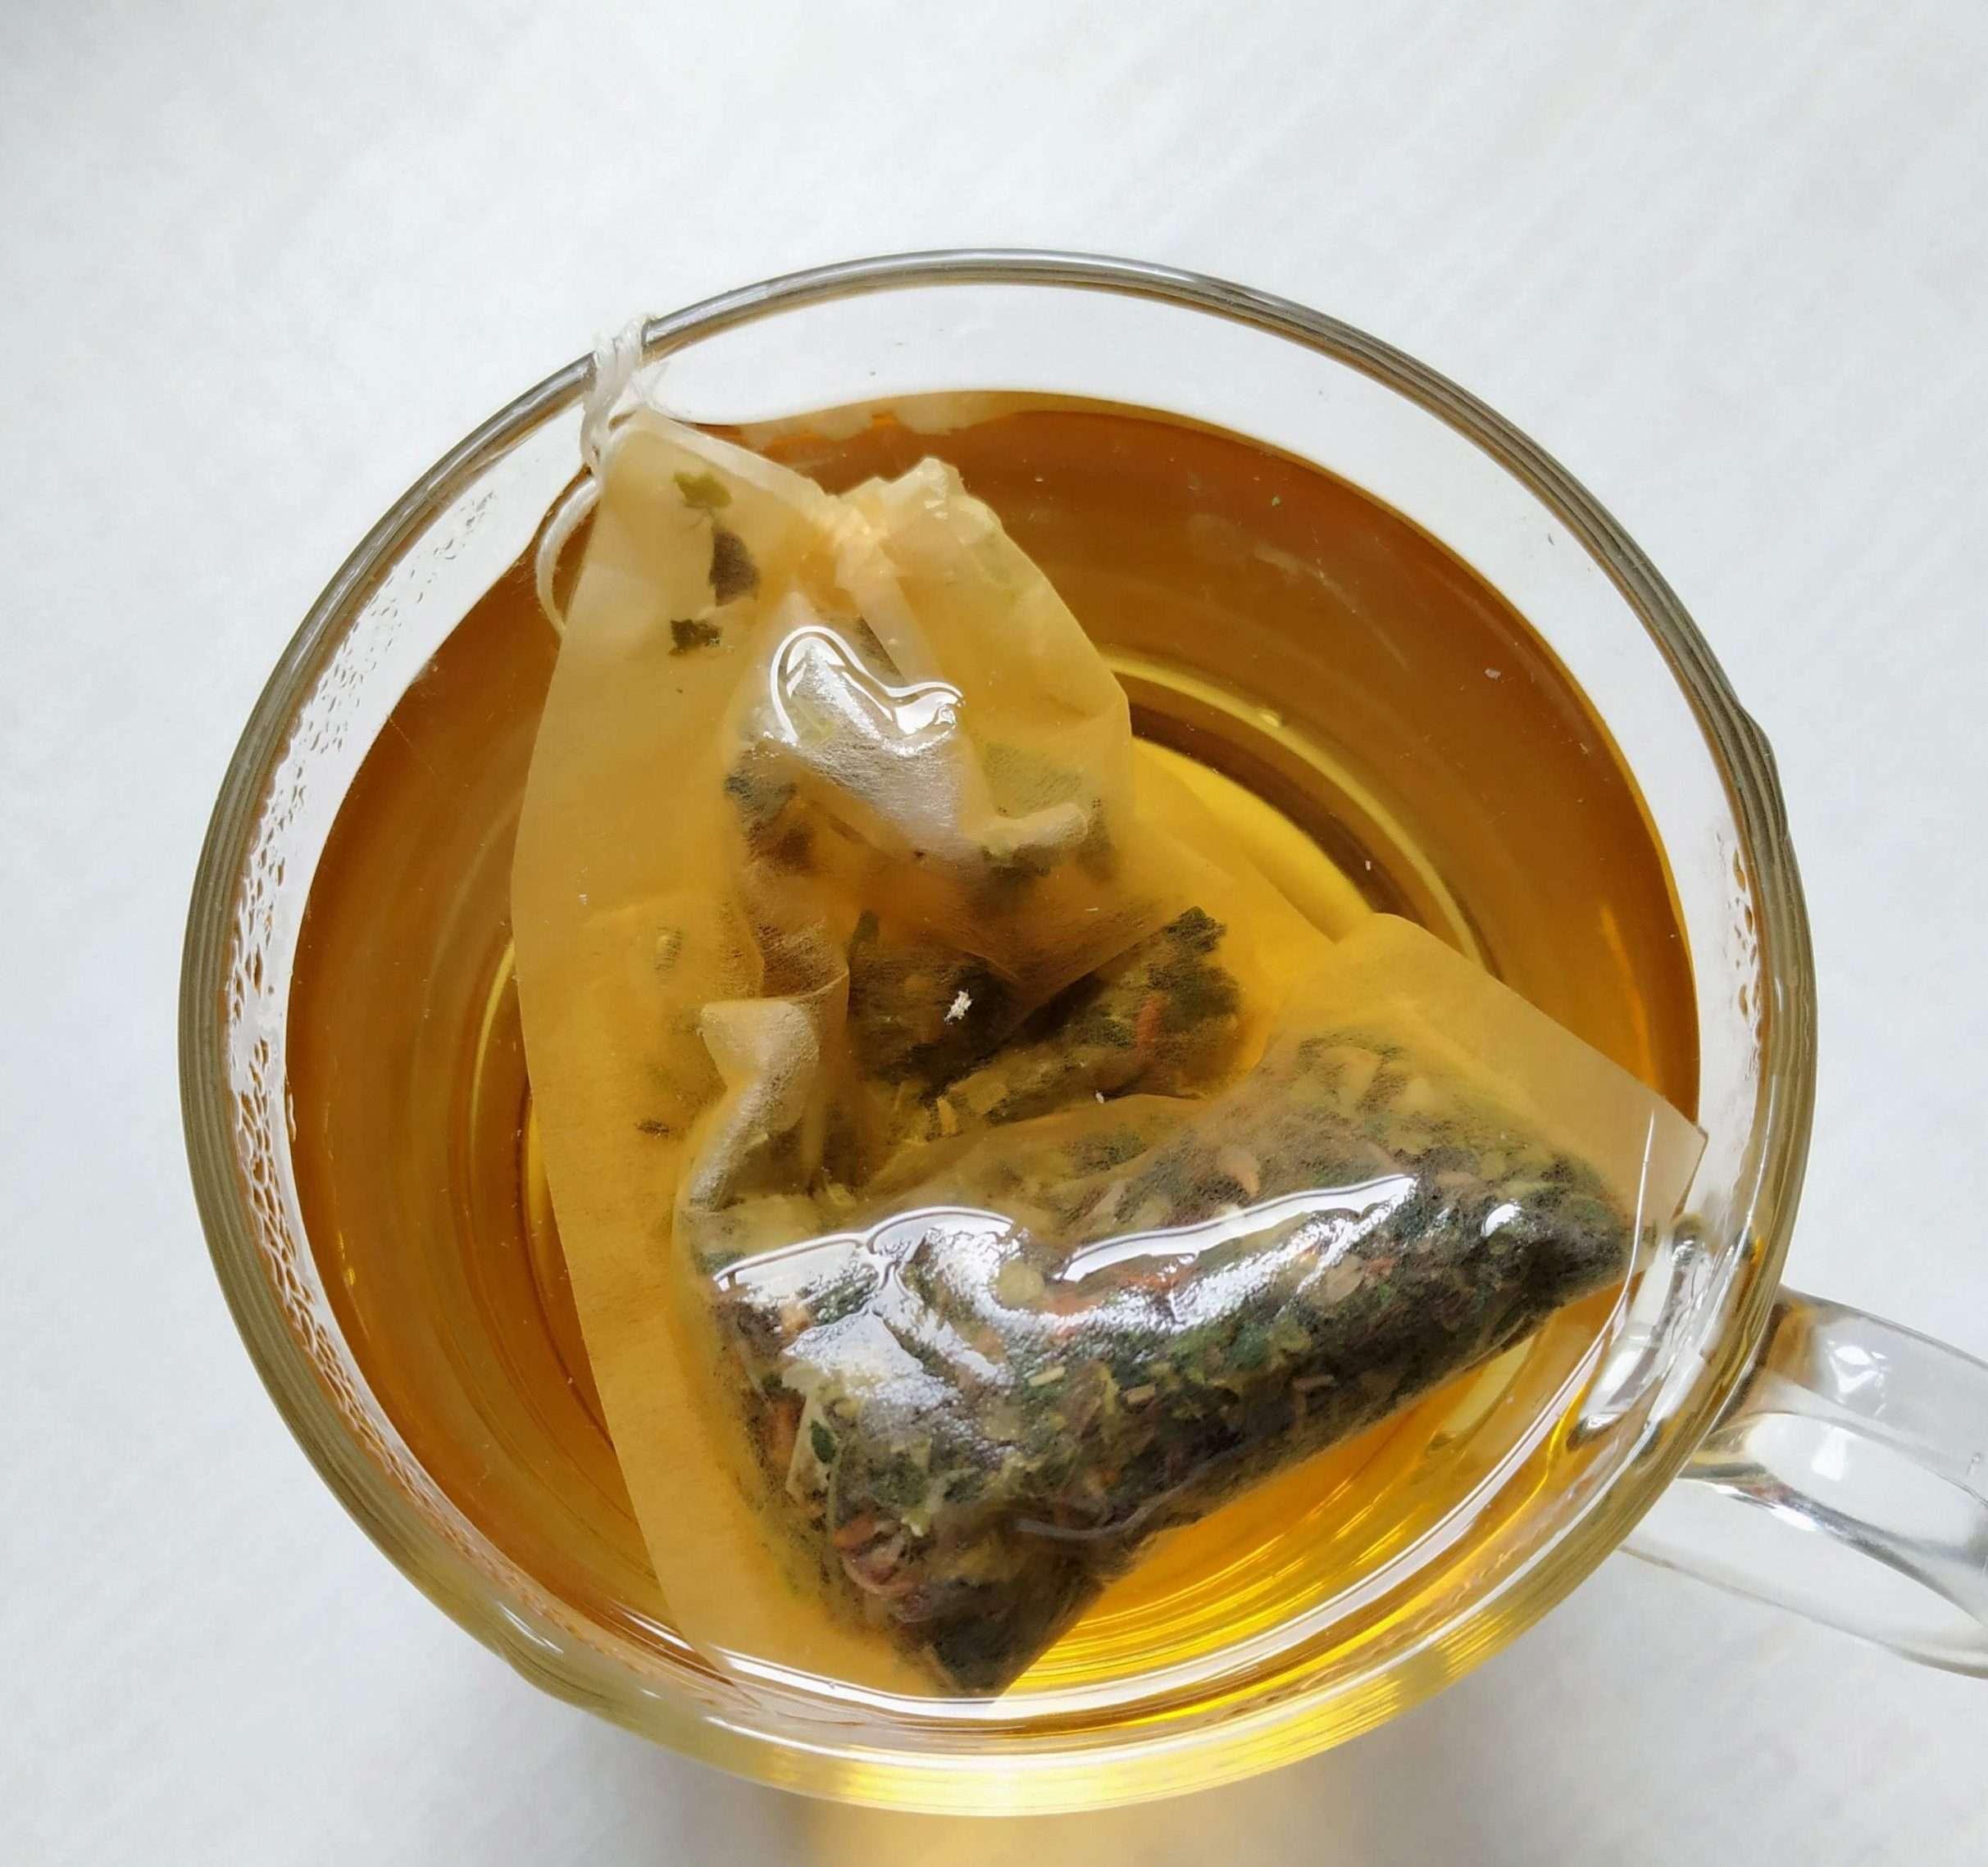 Cup of womb tea